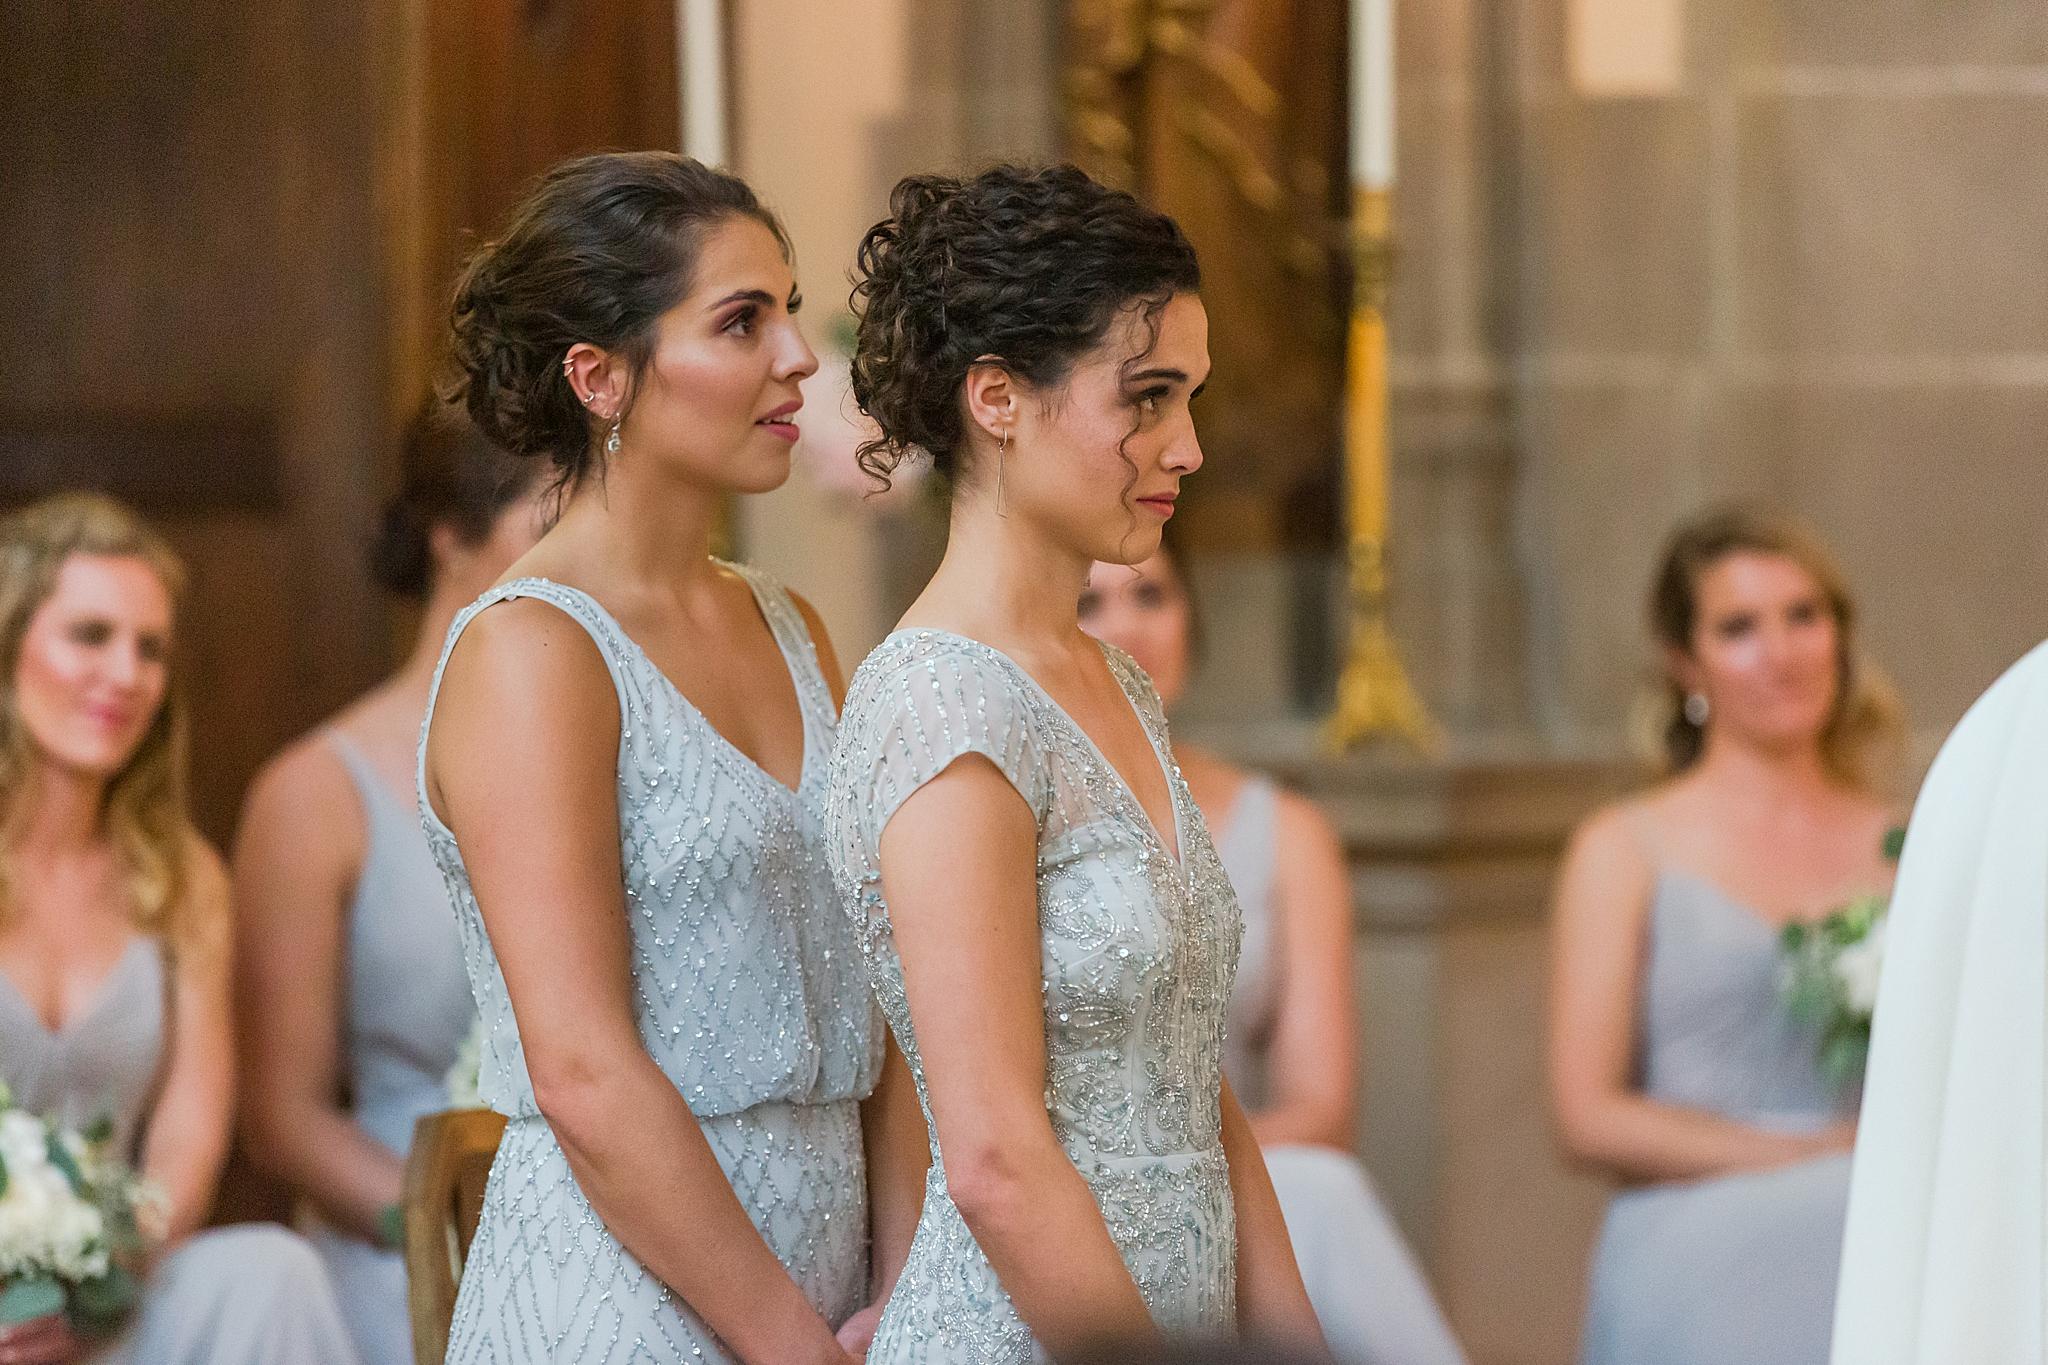 detroit-wedding-photographer-grosse-pointe-academy-chapel-detroit-golf-club-wedding-carly-matt-by-courtney-carolyn-photography_0041.jpg